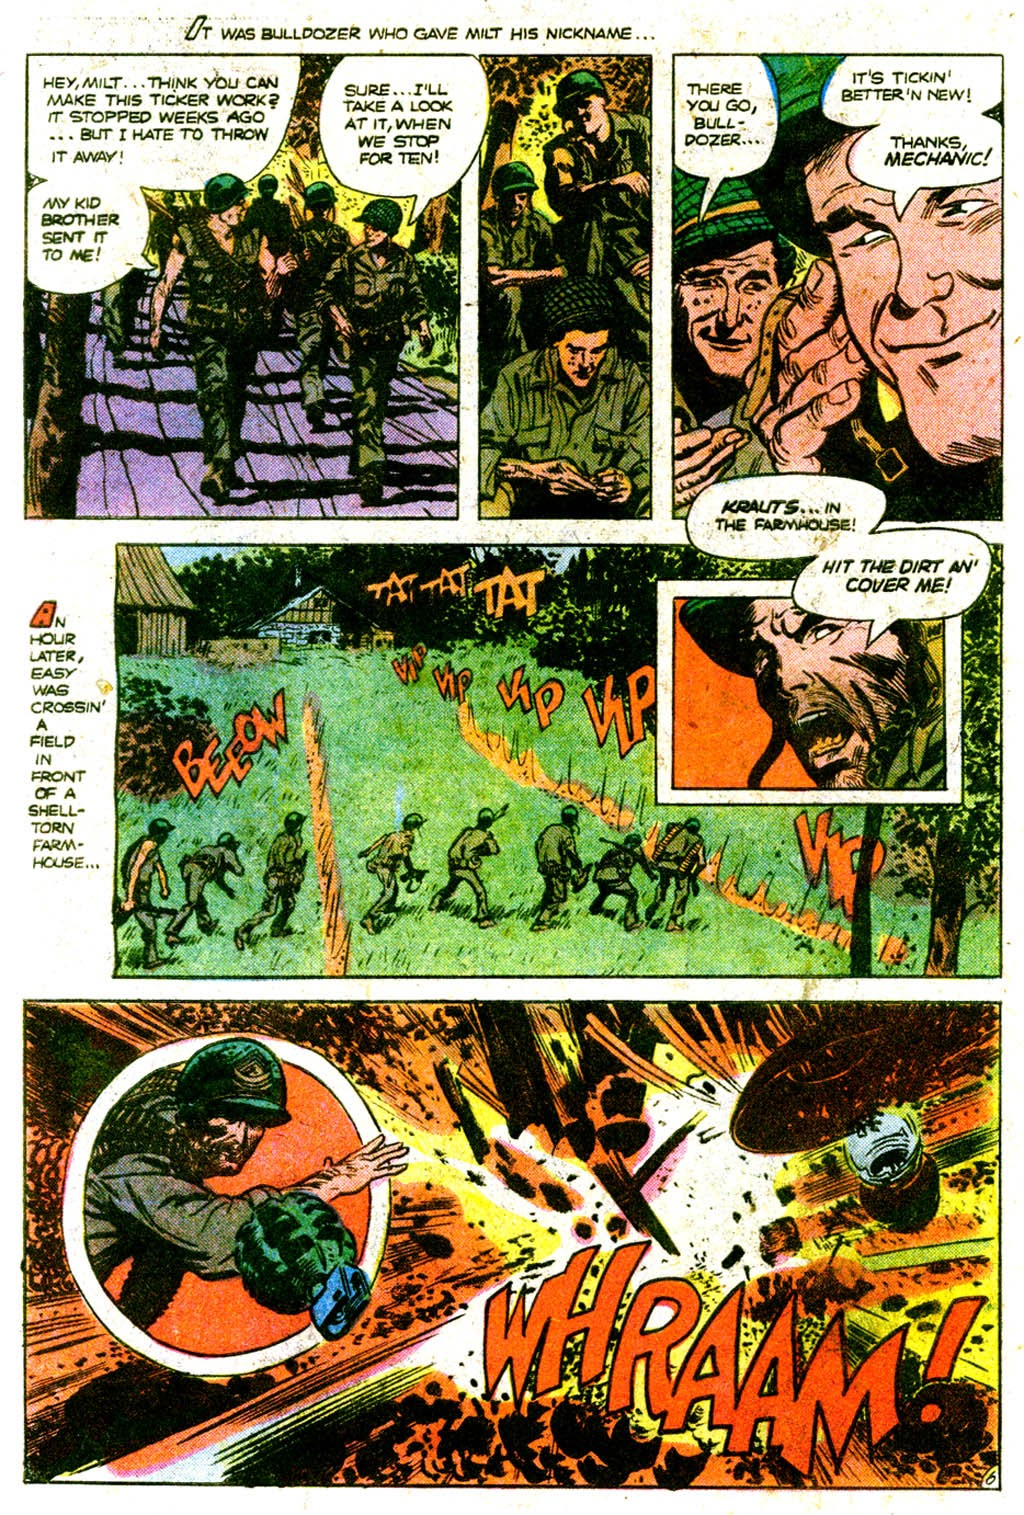 Read online Sgt. Rock comic -  Issue #313 - 9